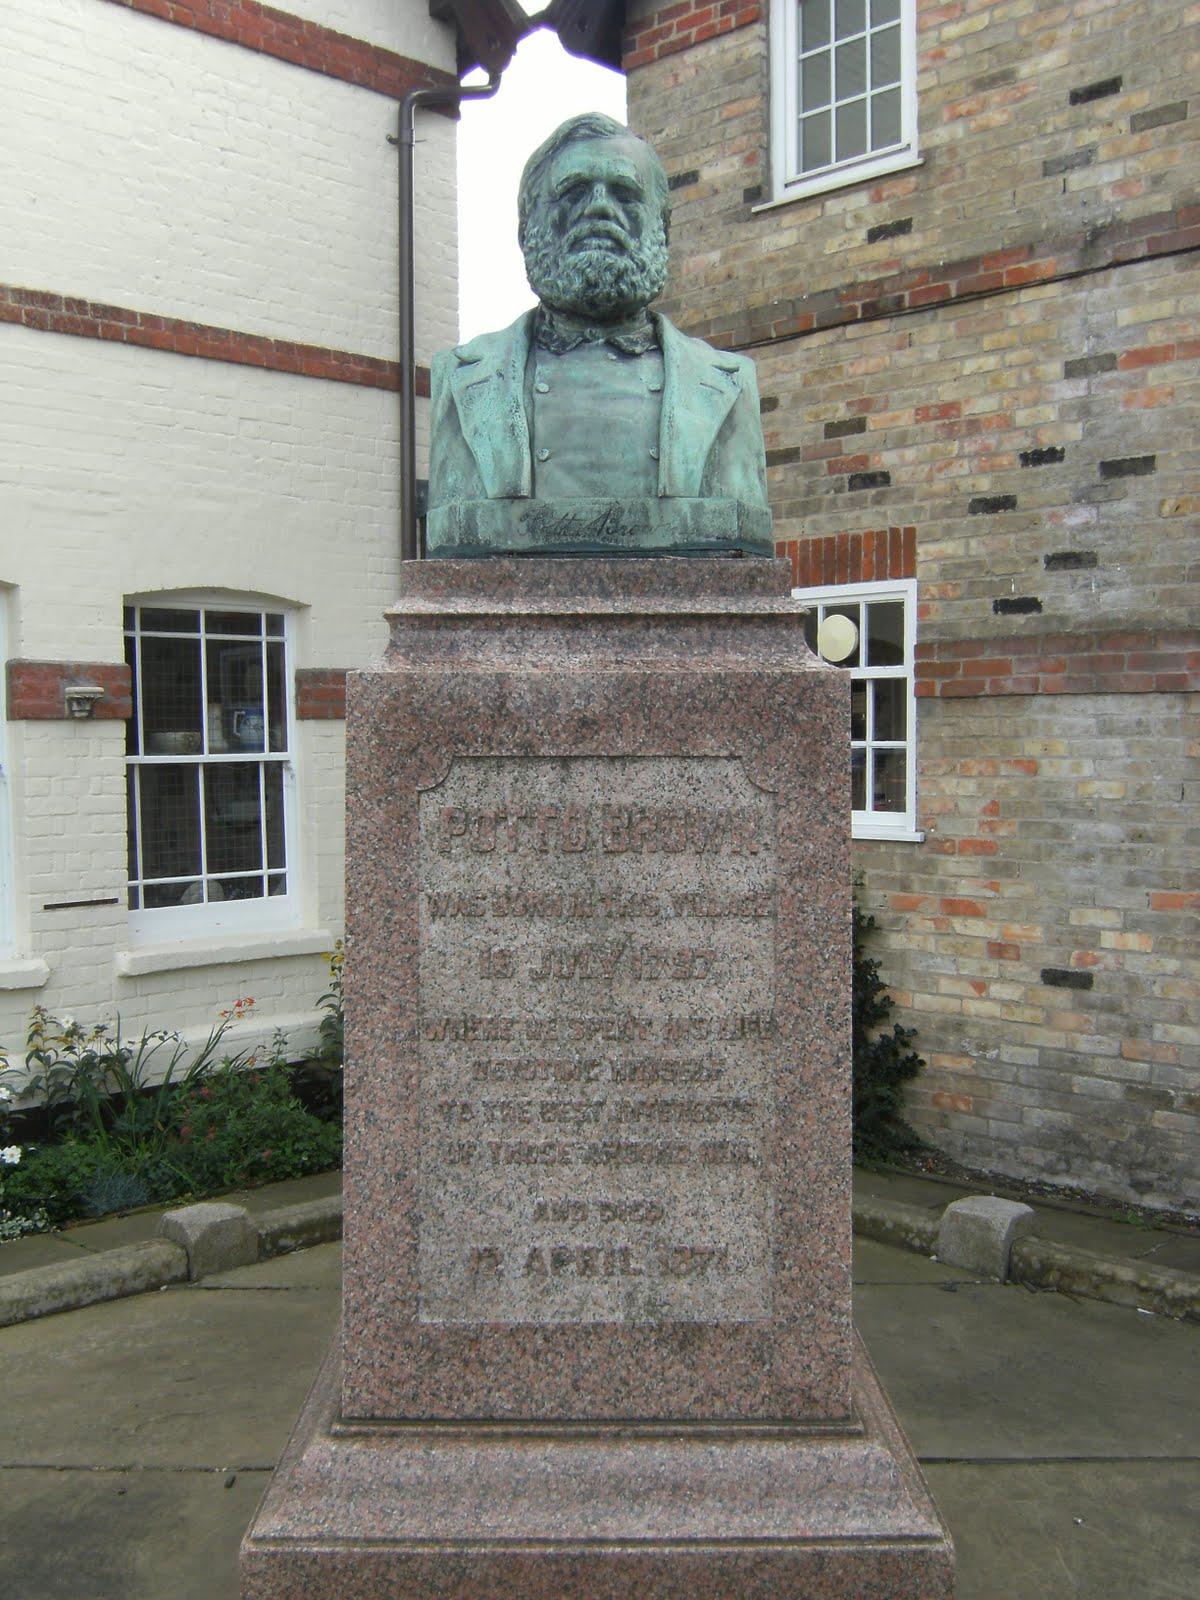 DSCF9441 Statue of Potto Brown, Houghton